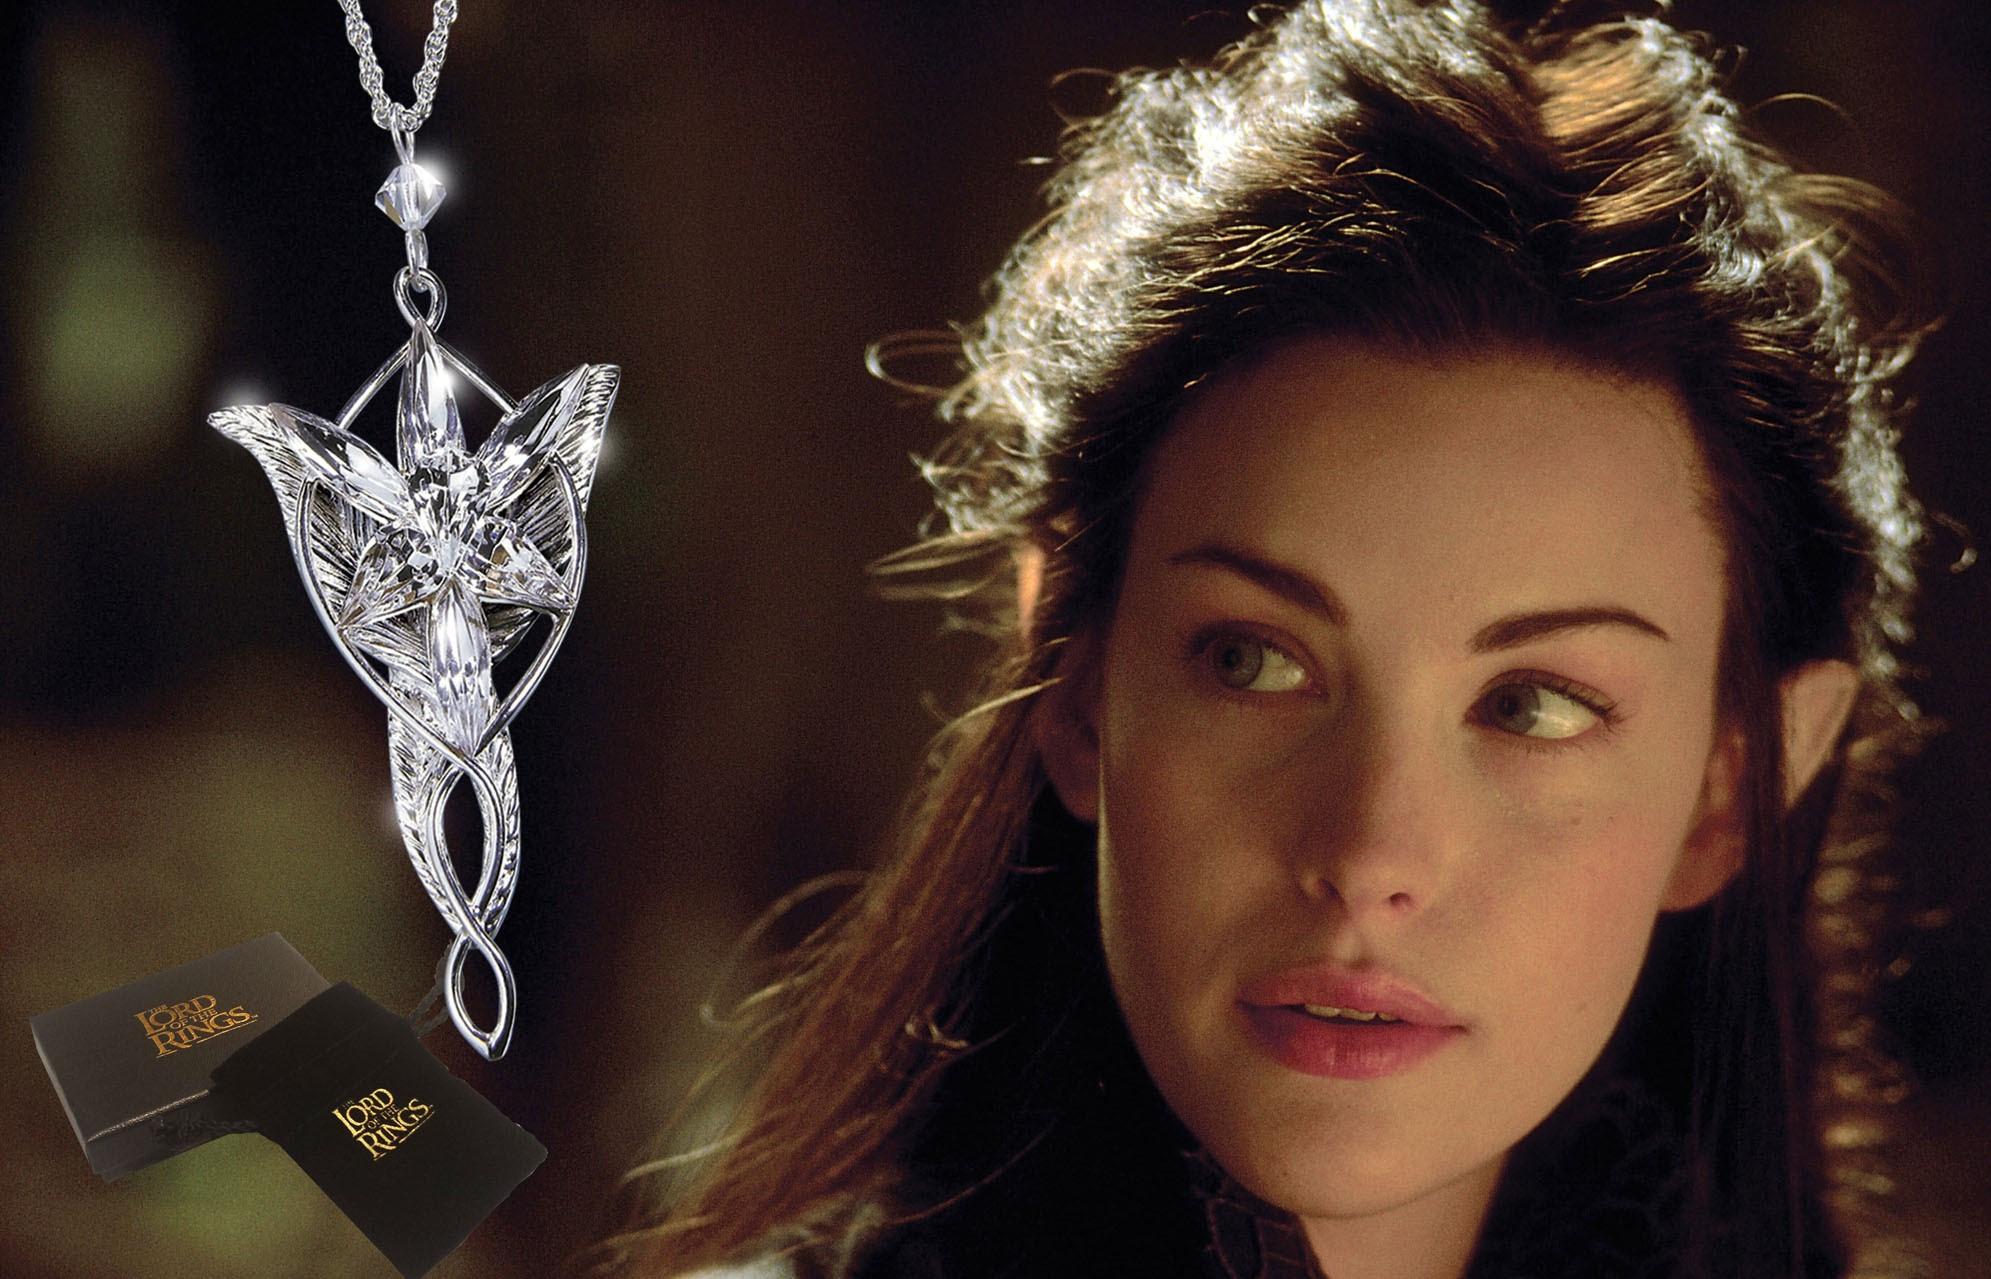 Lord Of The Rings - Arwen nyaklánc